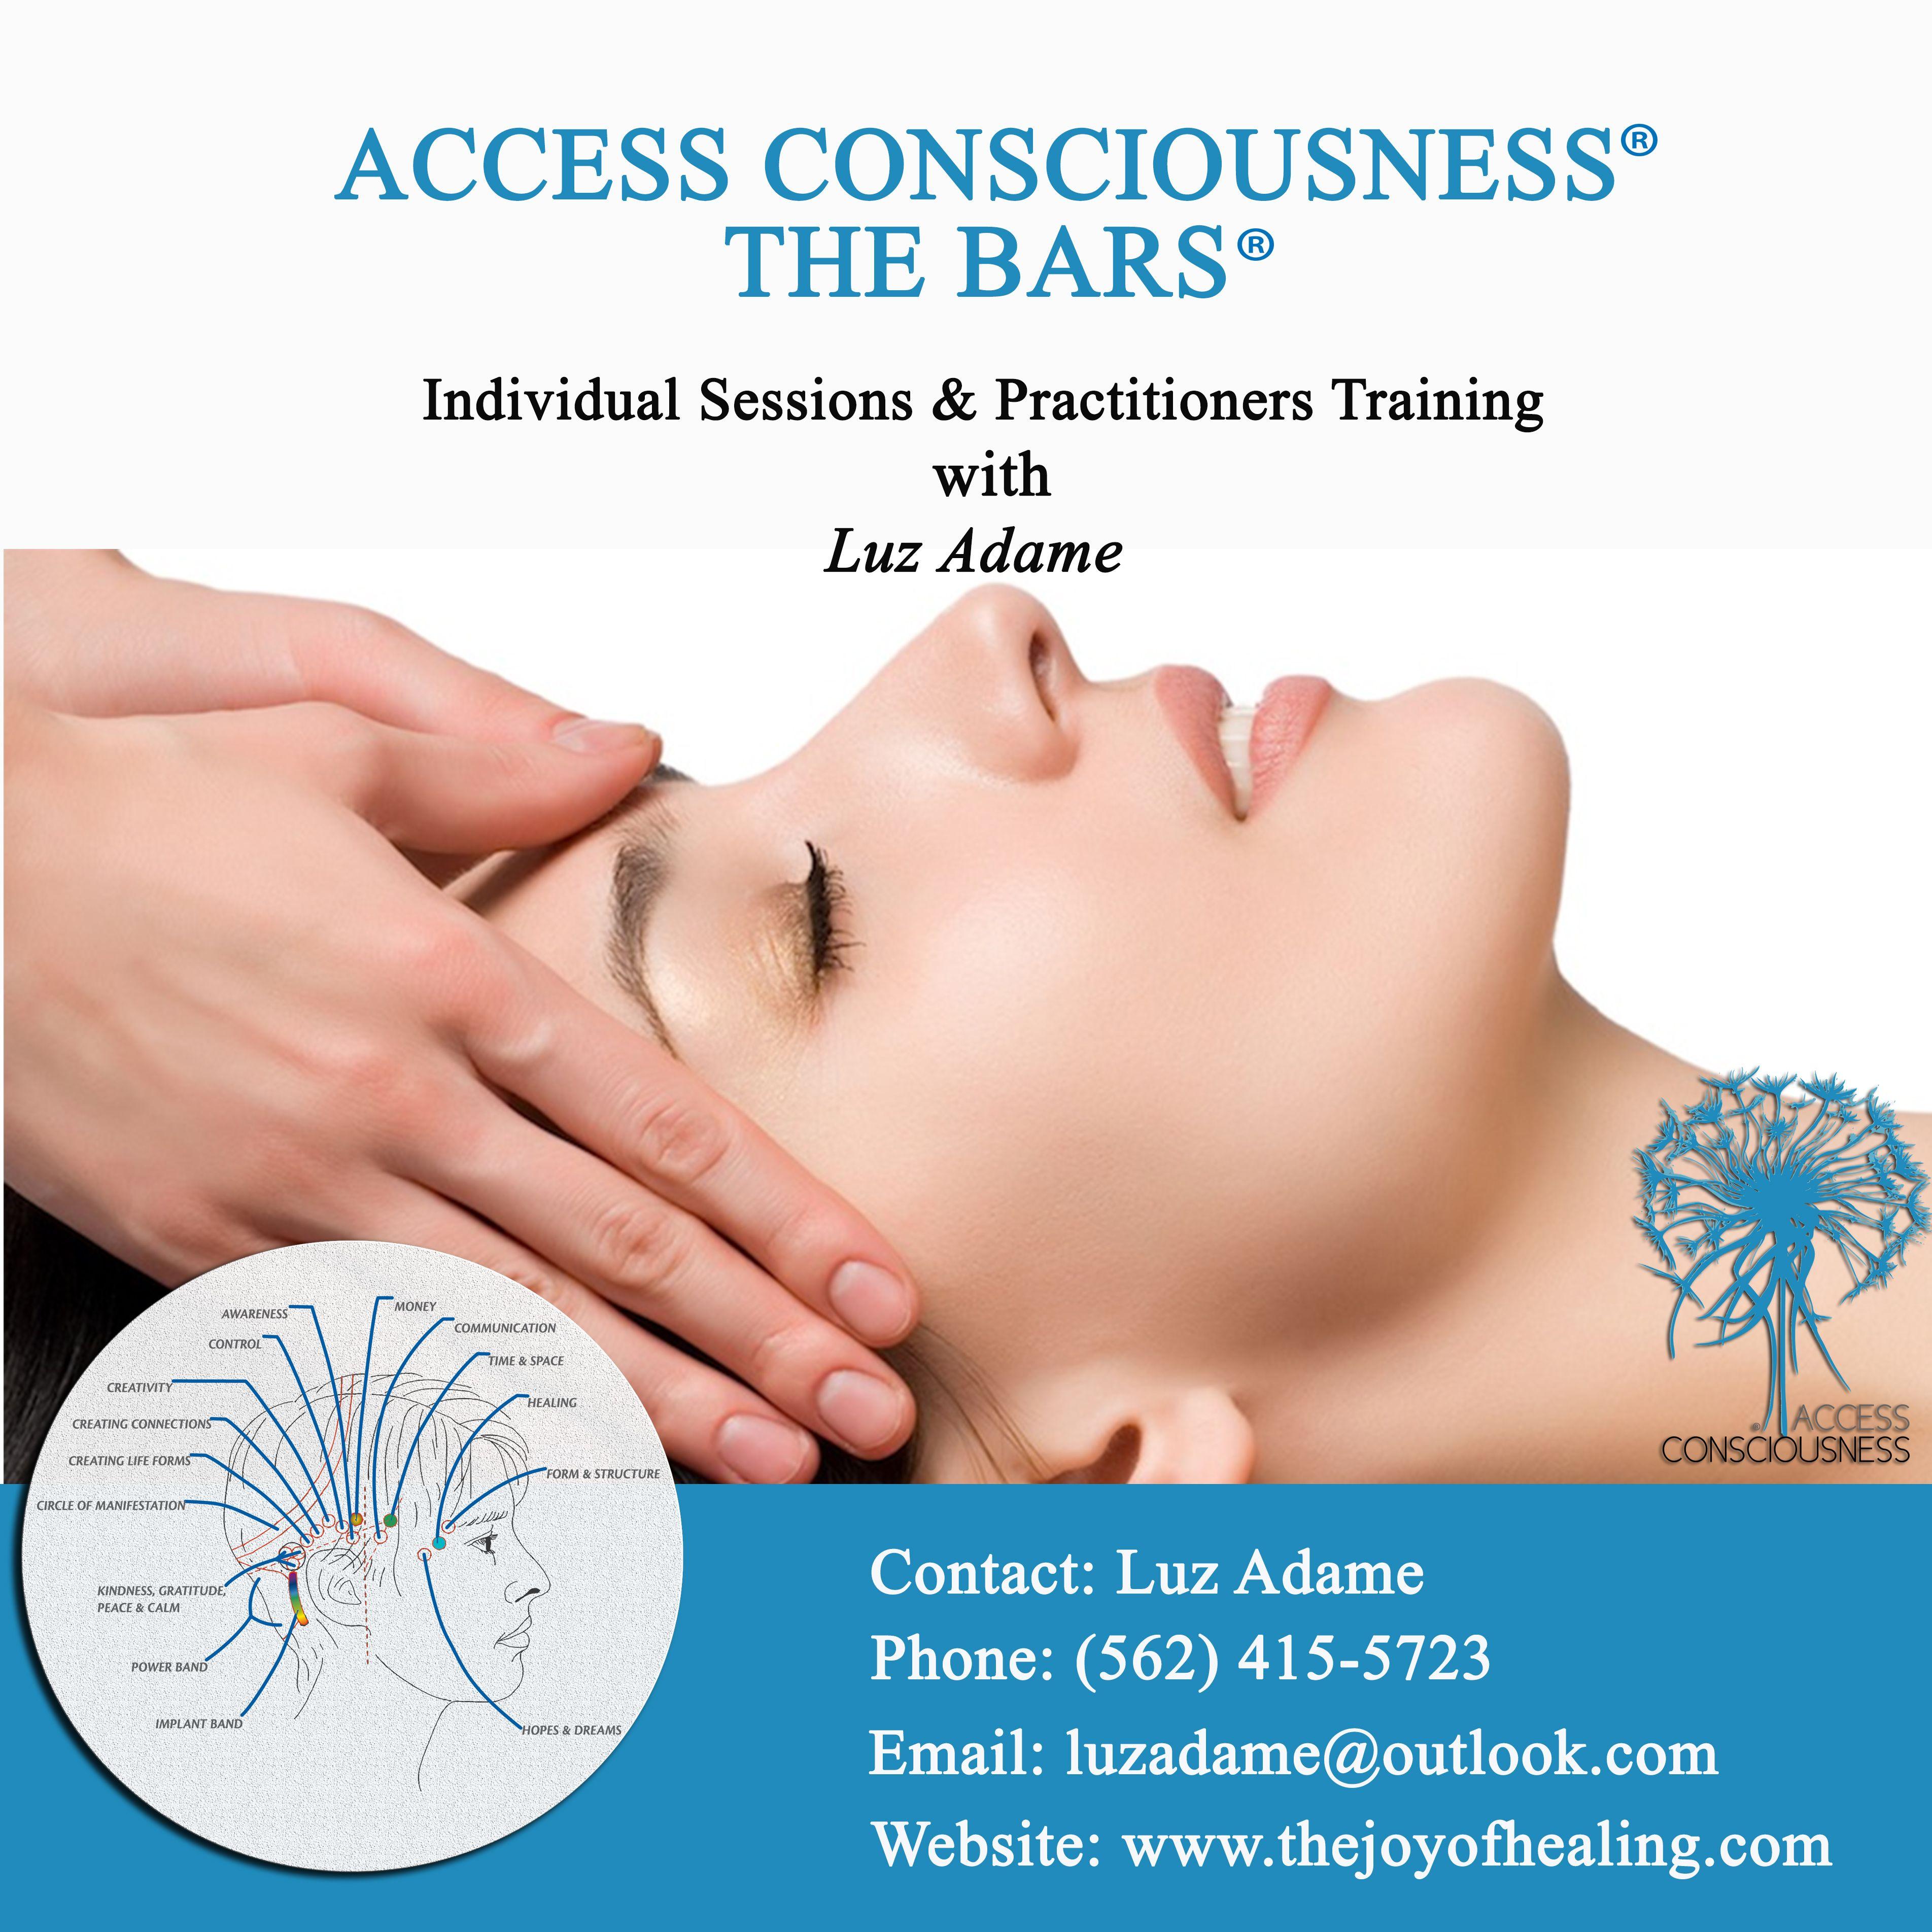 Access consciousness the bars access consciousness